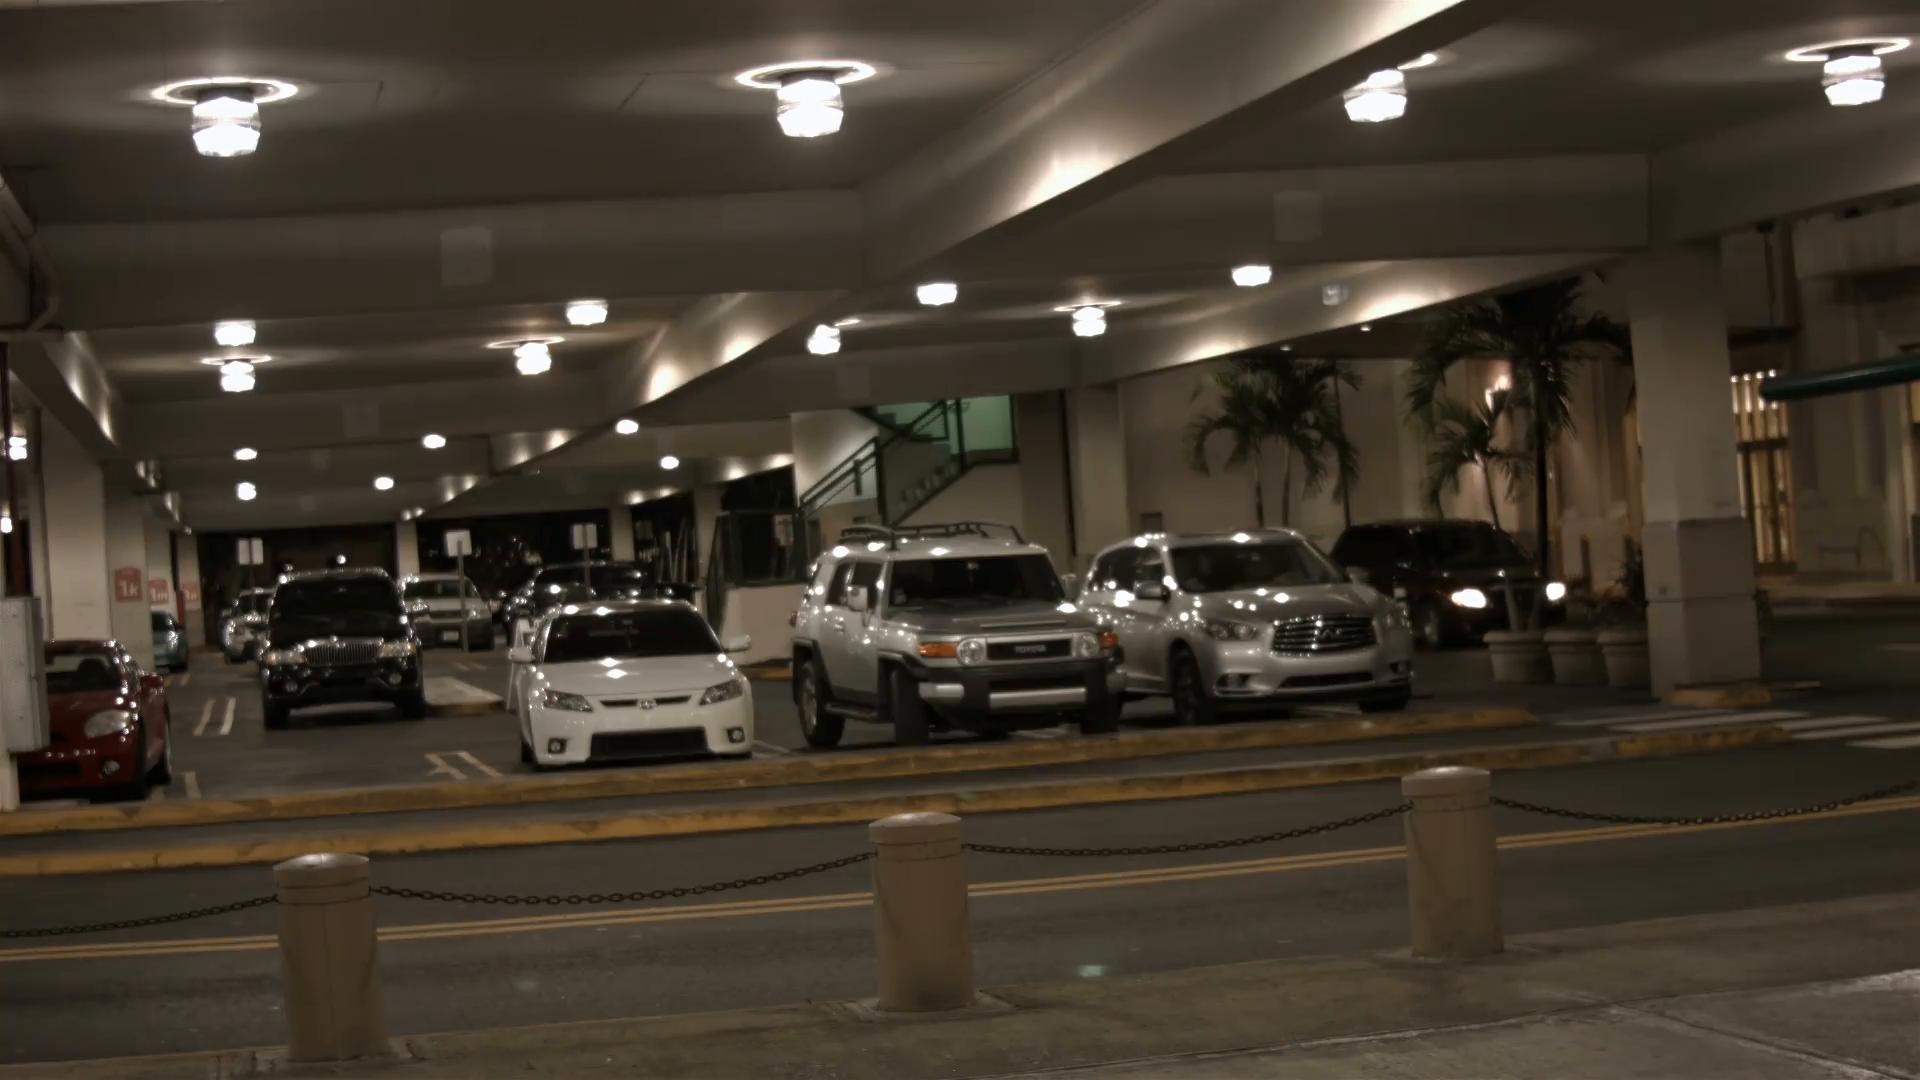 Parking garage shopping mall busy traffic HD BM 1959 Stock Video Footage -  VideoBlocks - Parking Lot PNG HD